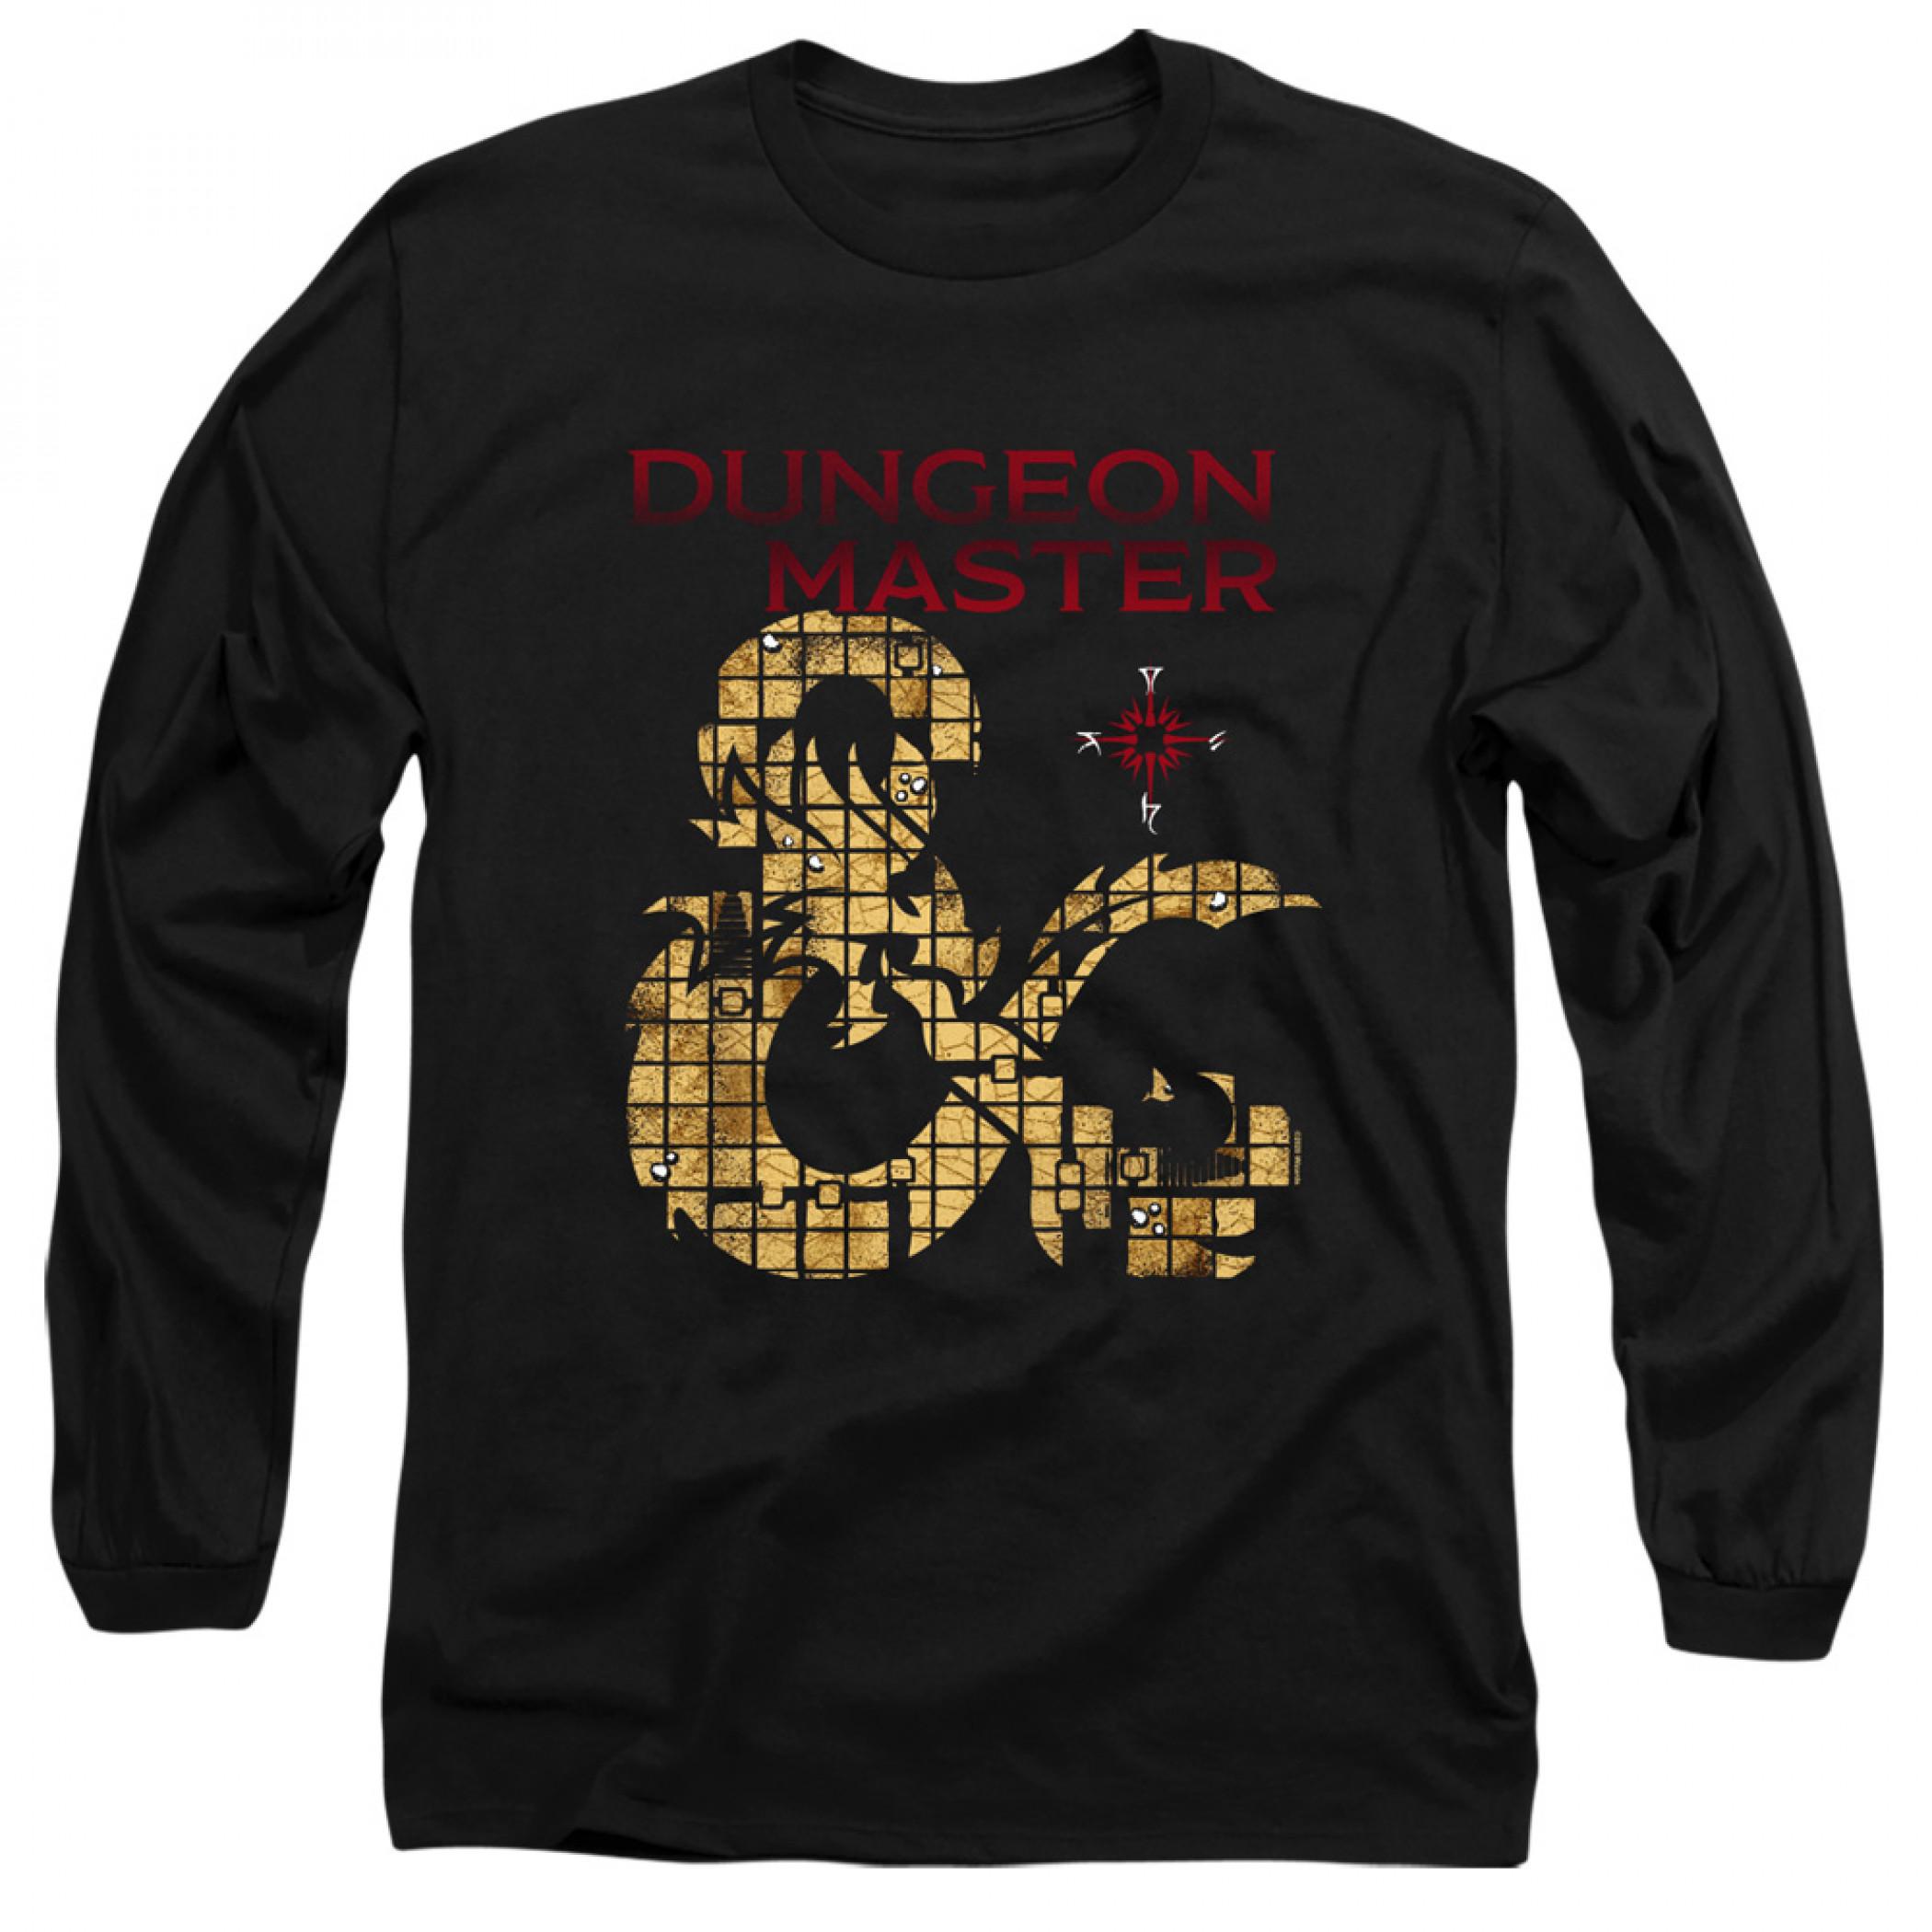 Dungeons & Dragons Dungeon Master Long Sleeve Shirt